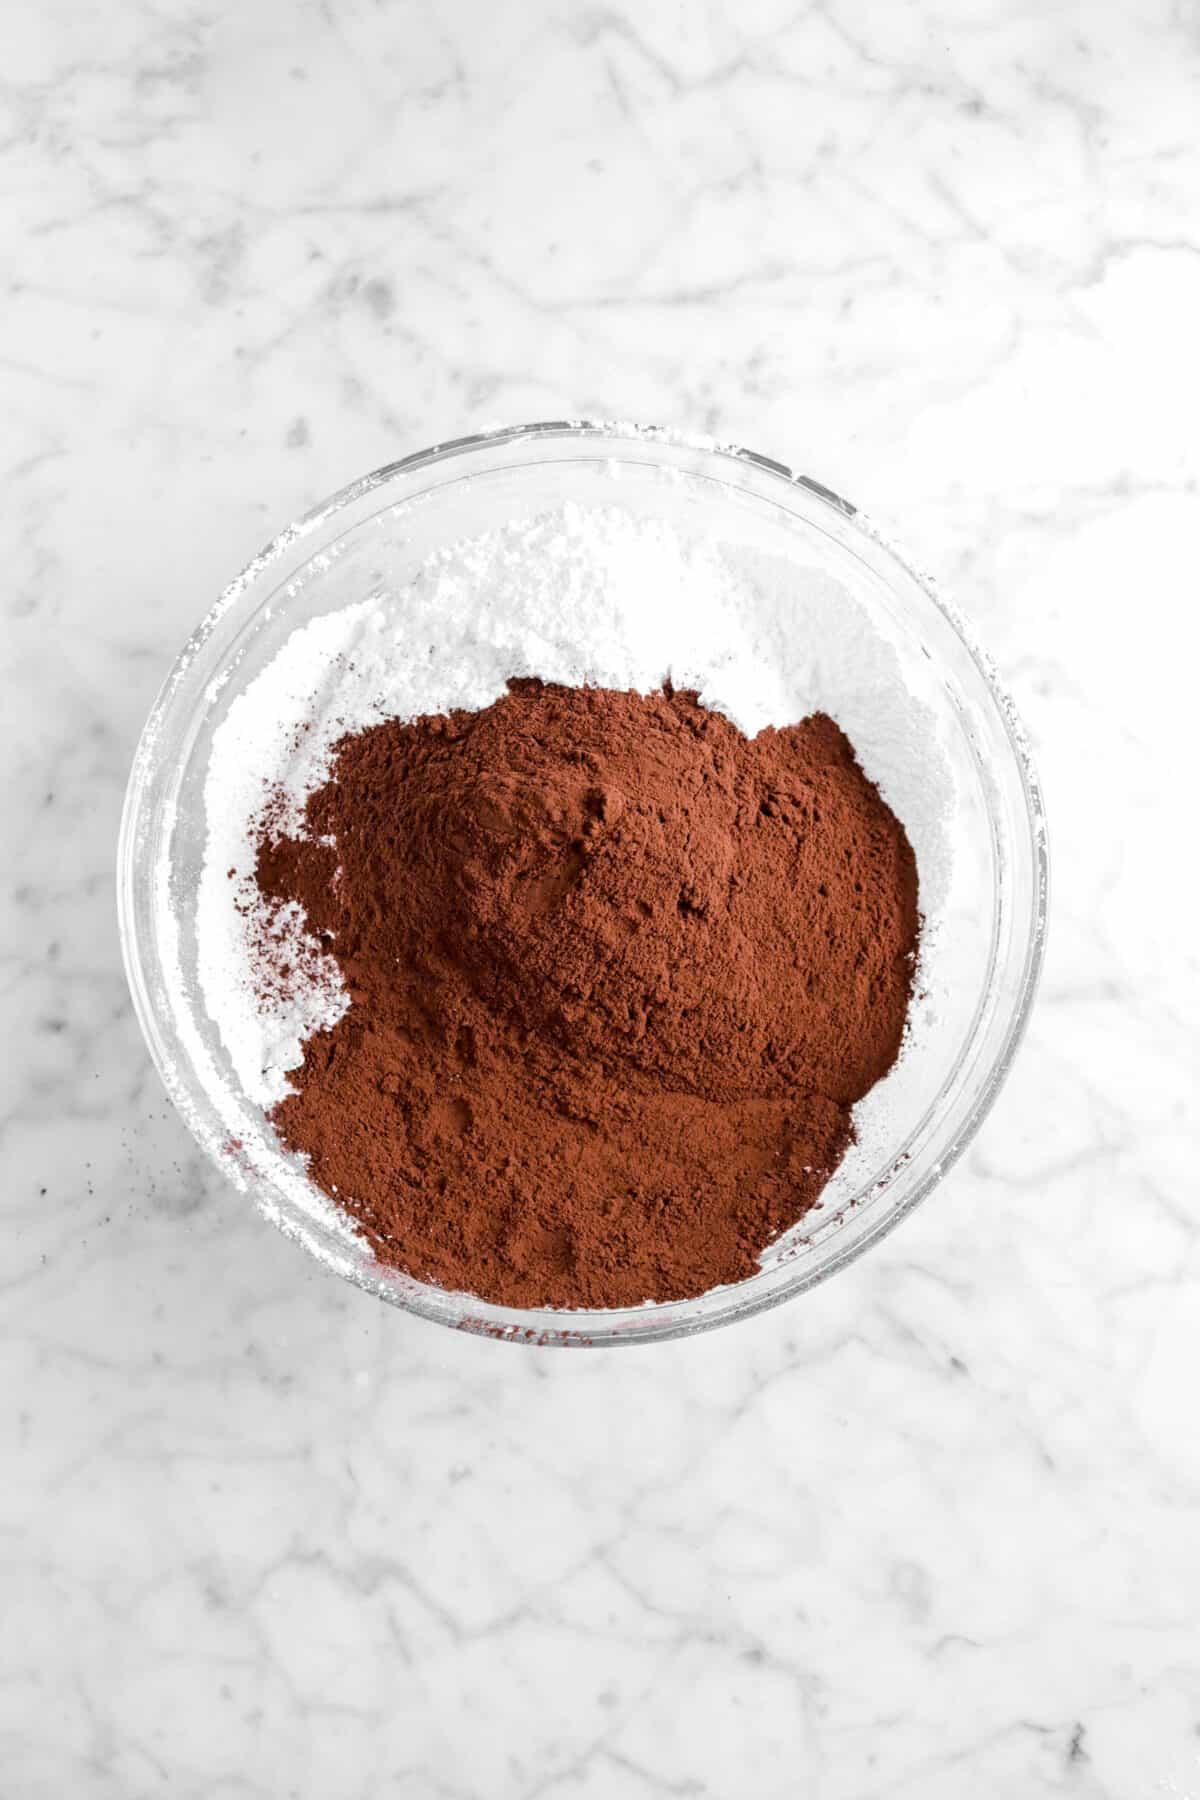 cocoa powder and powdered sugar in glass bowl